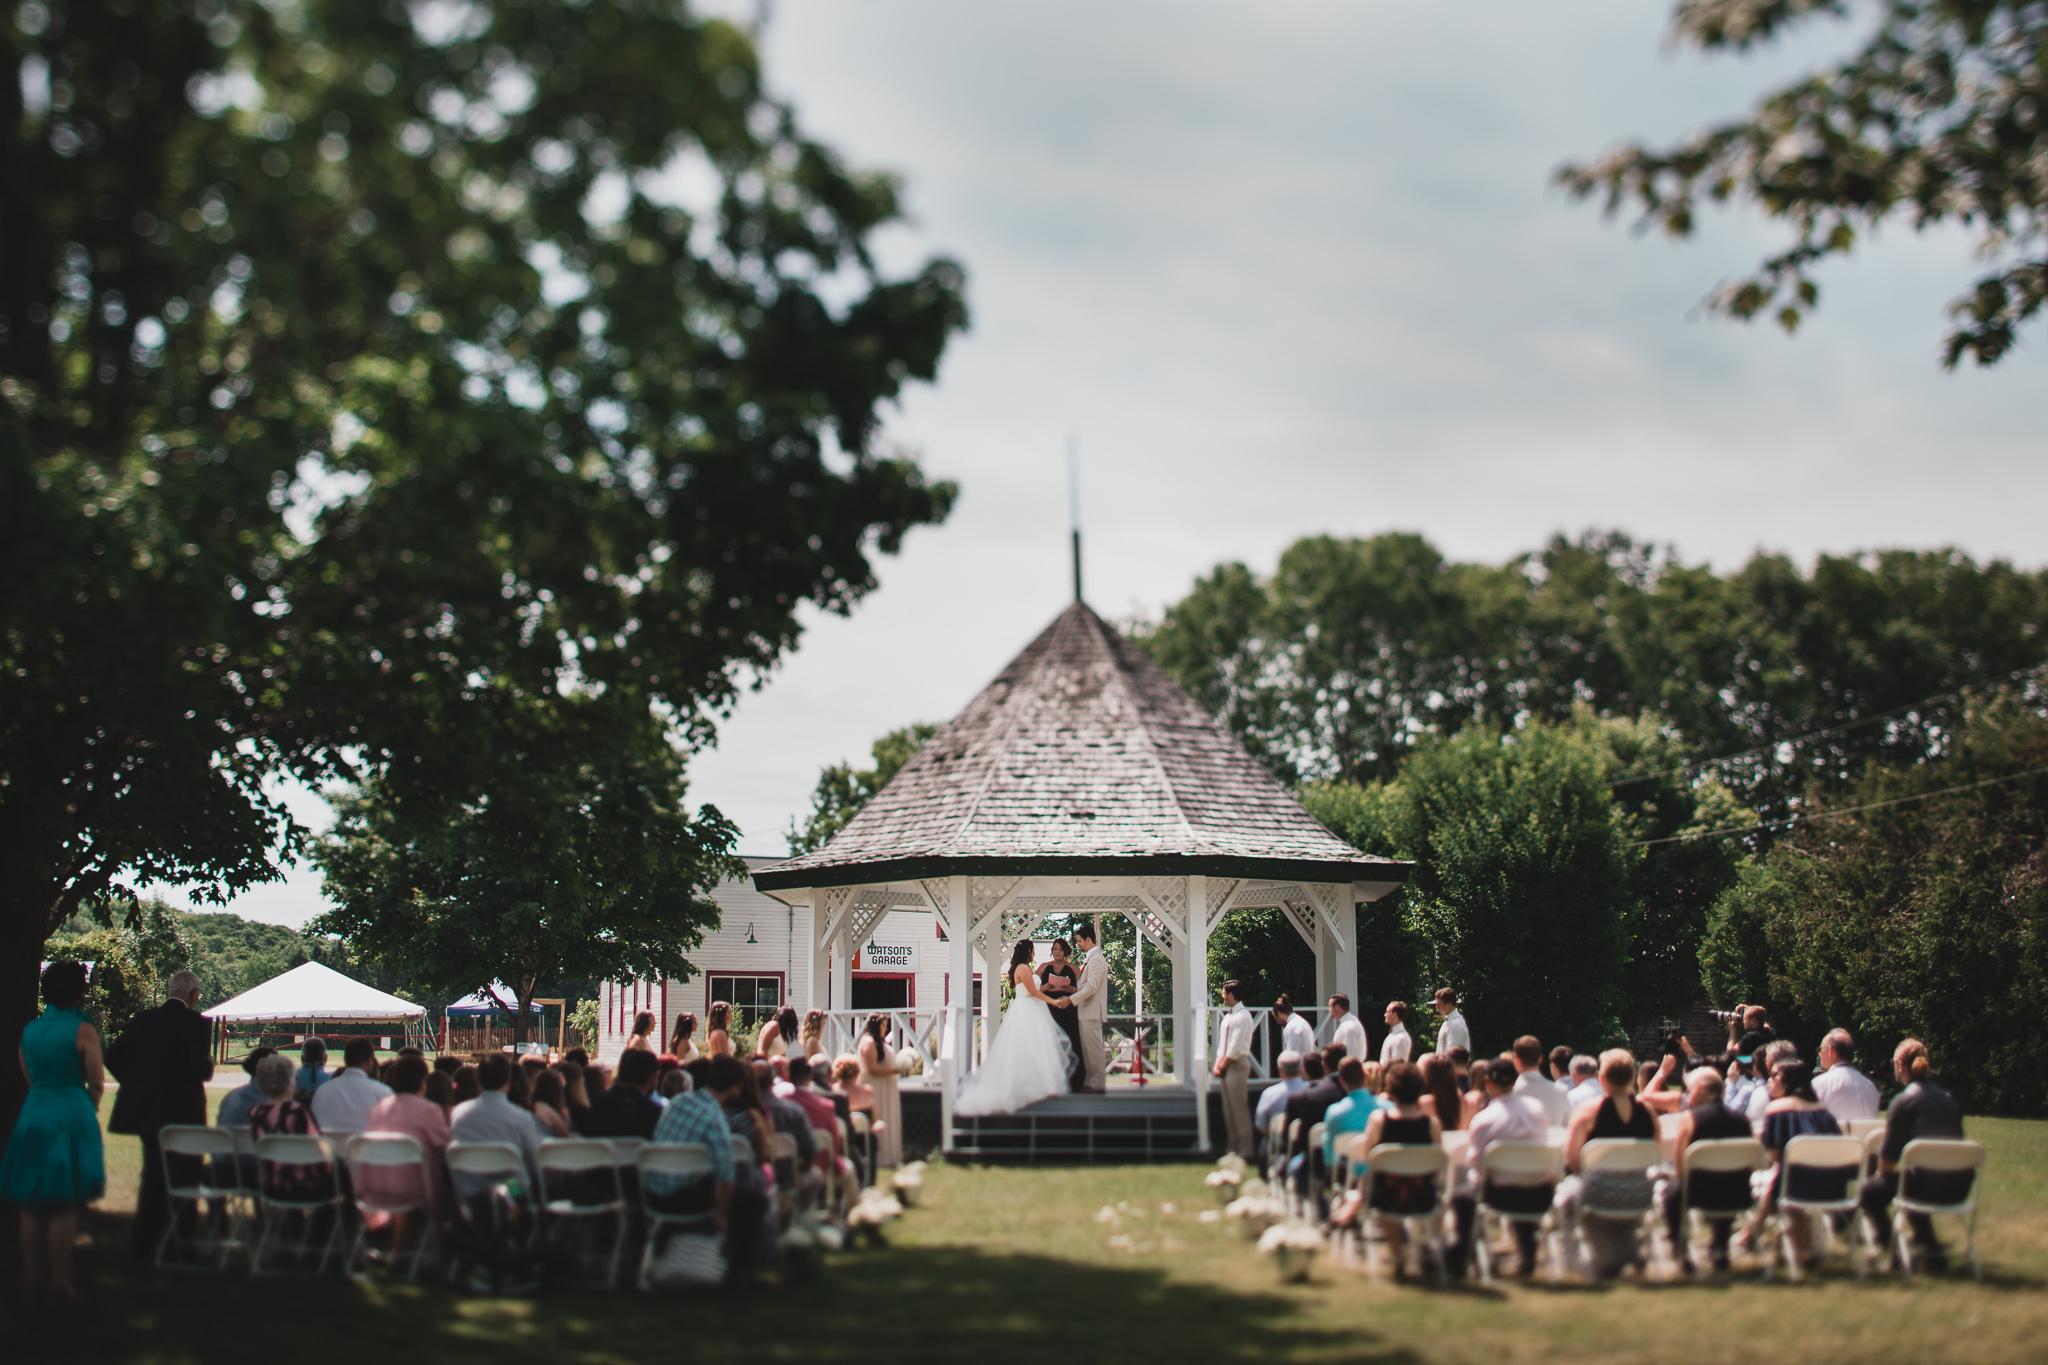 Ottawa outdoor wedding ceremony location